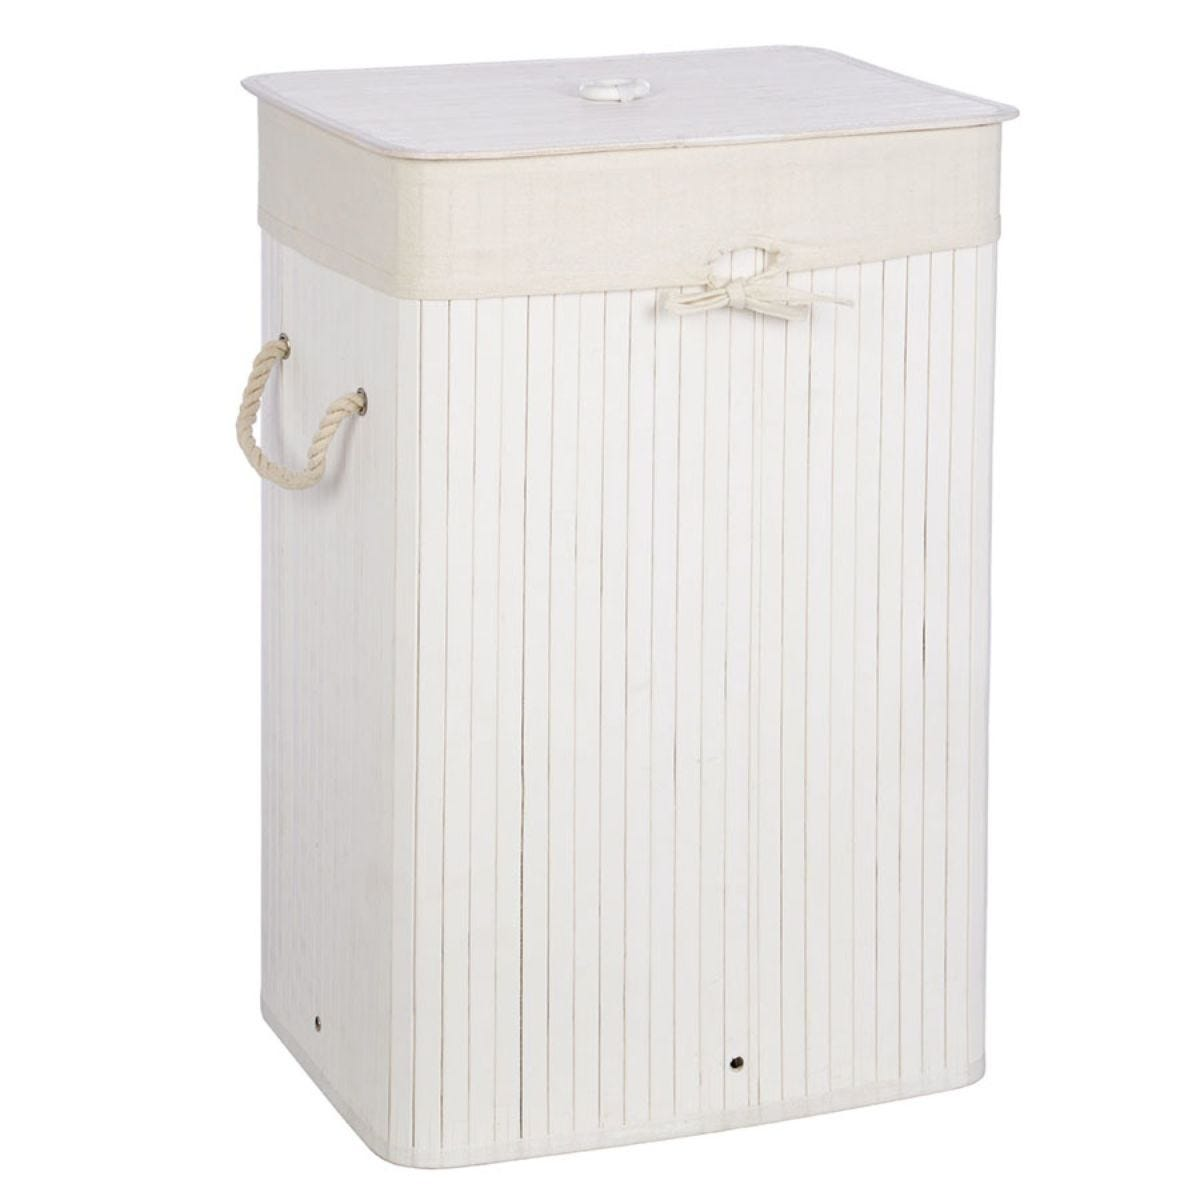 Premier Housewares Kankyo Laundry Hamper Bamboo - White